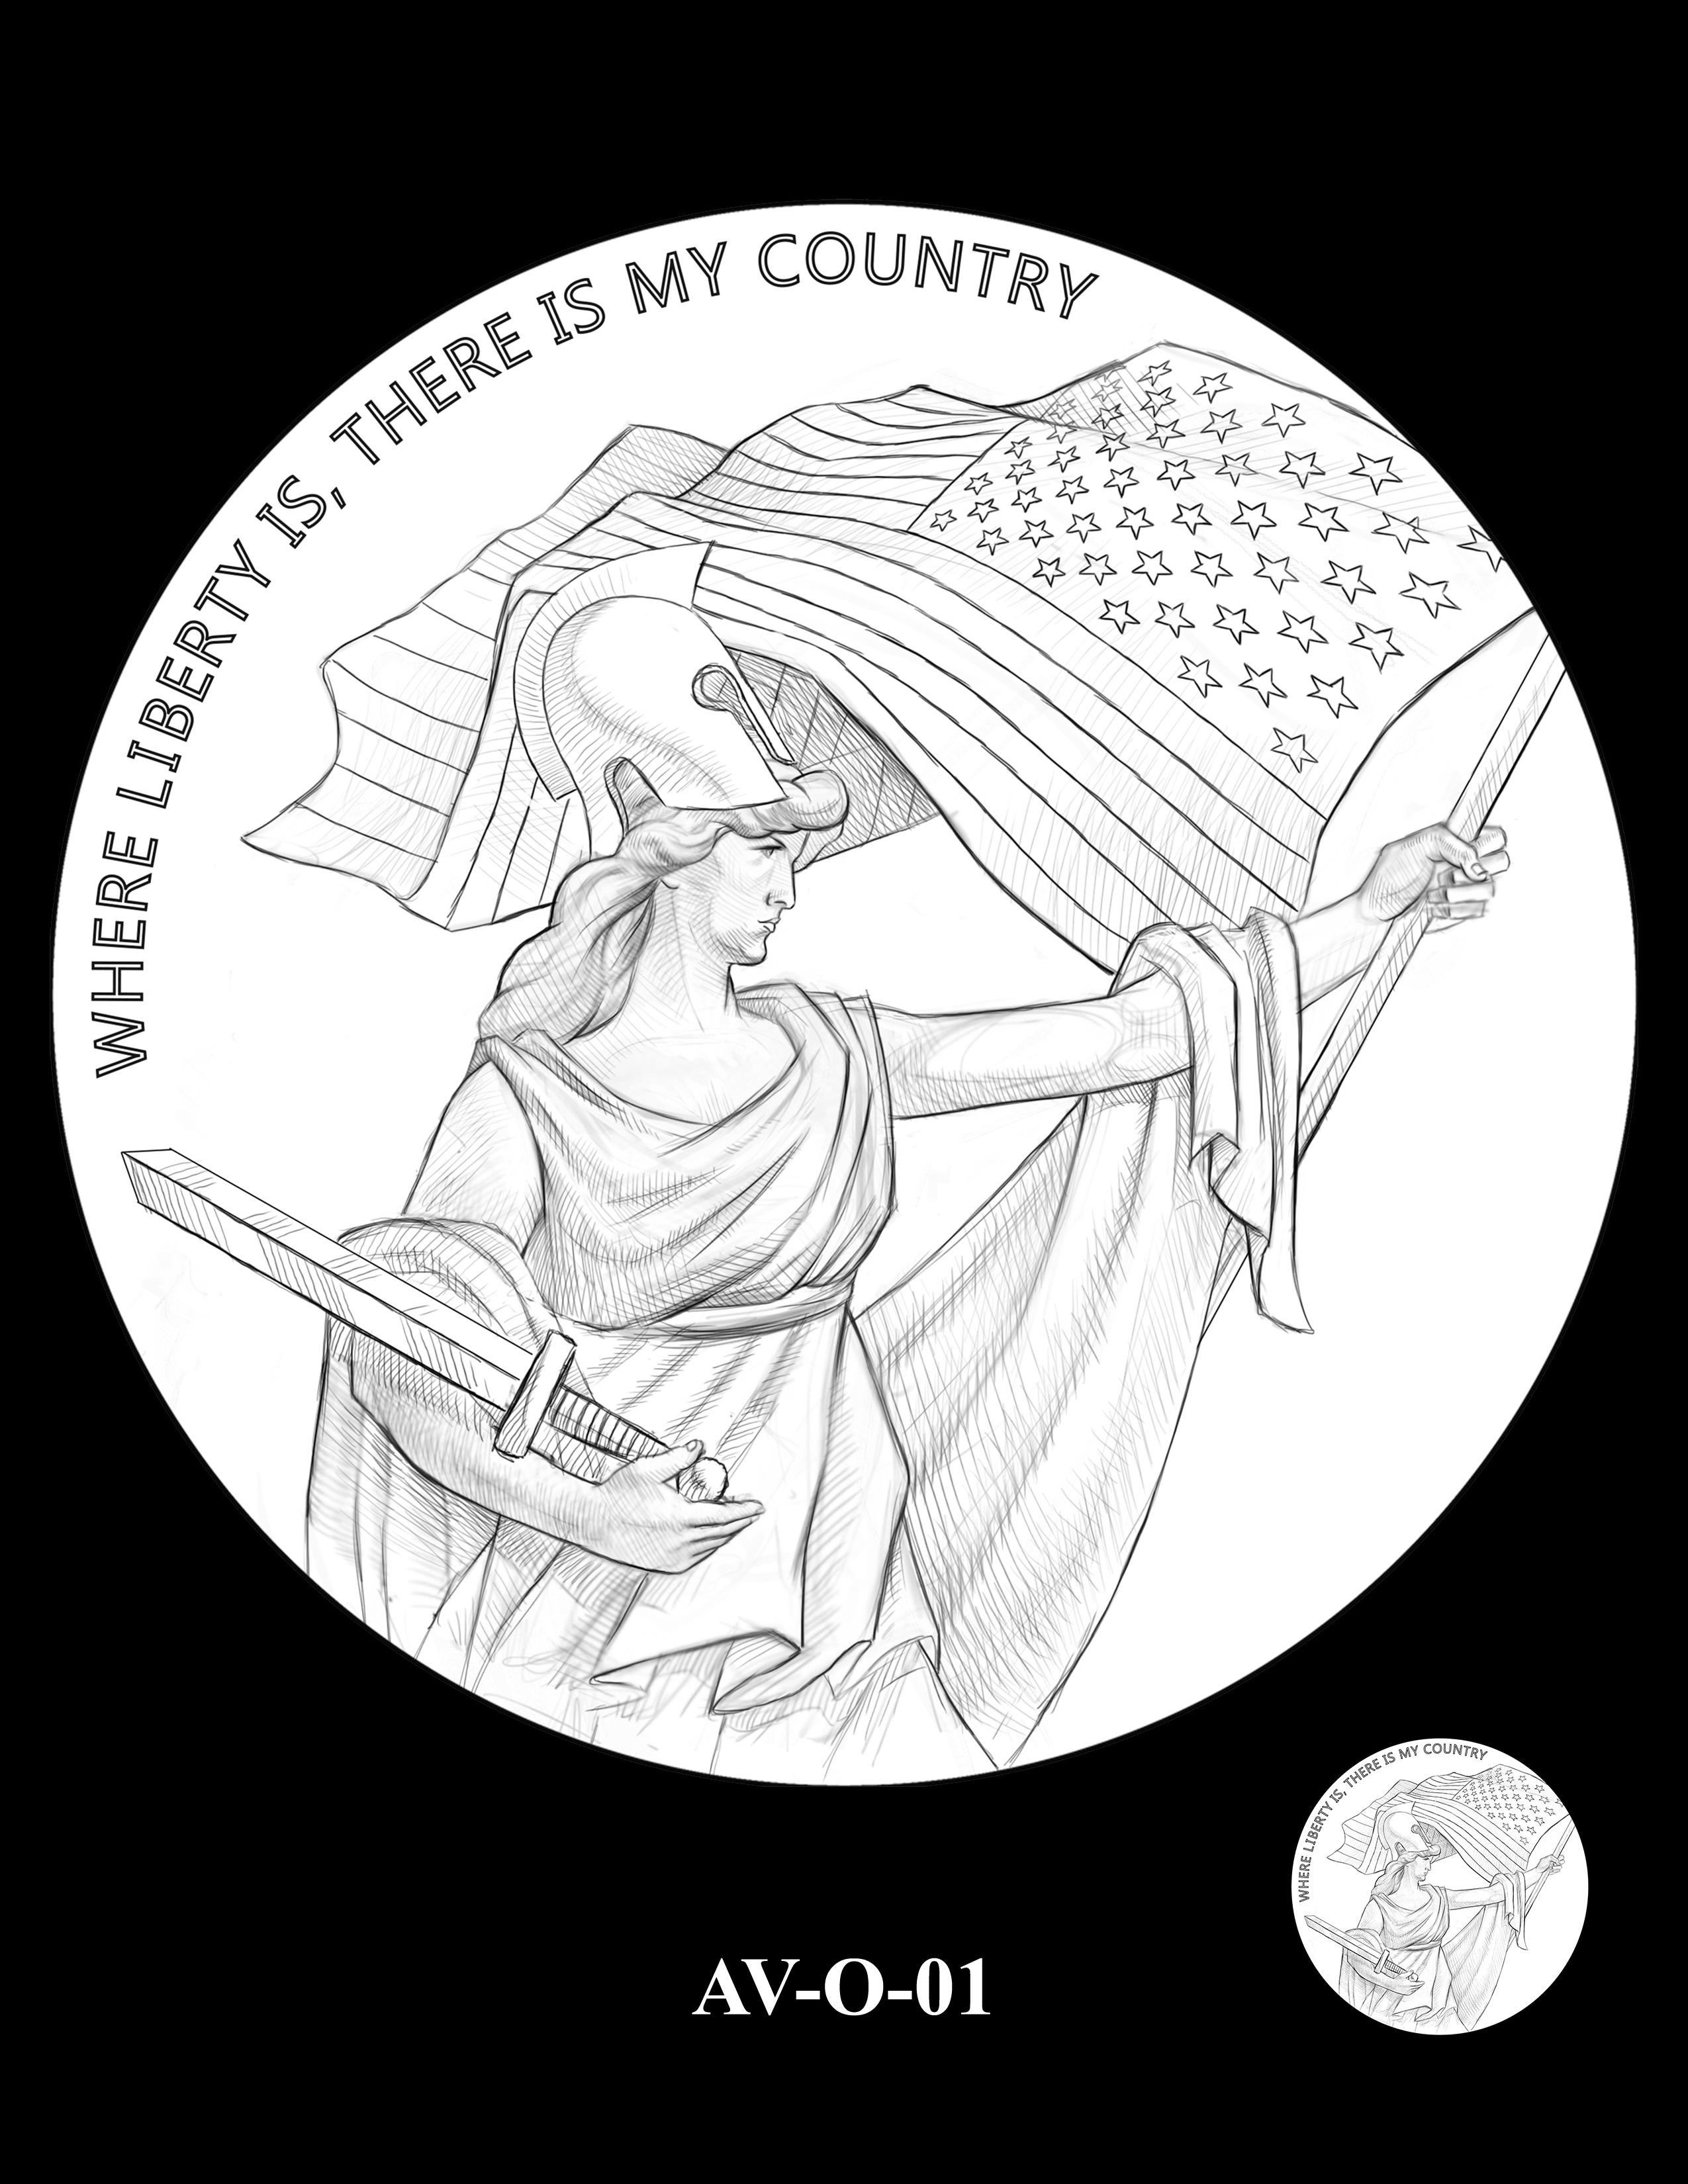 AV-O-01 - American Veterans Medal